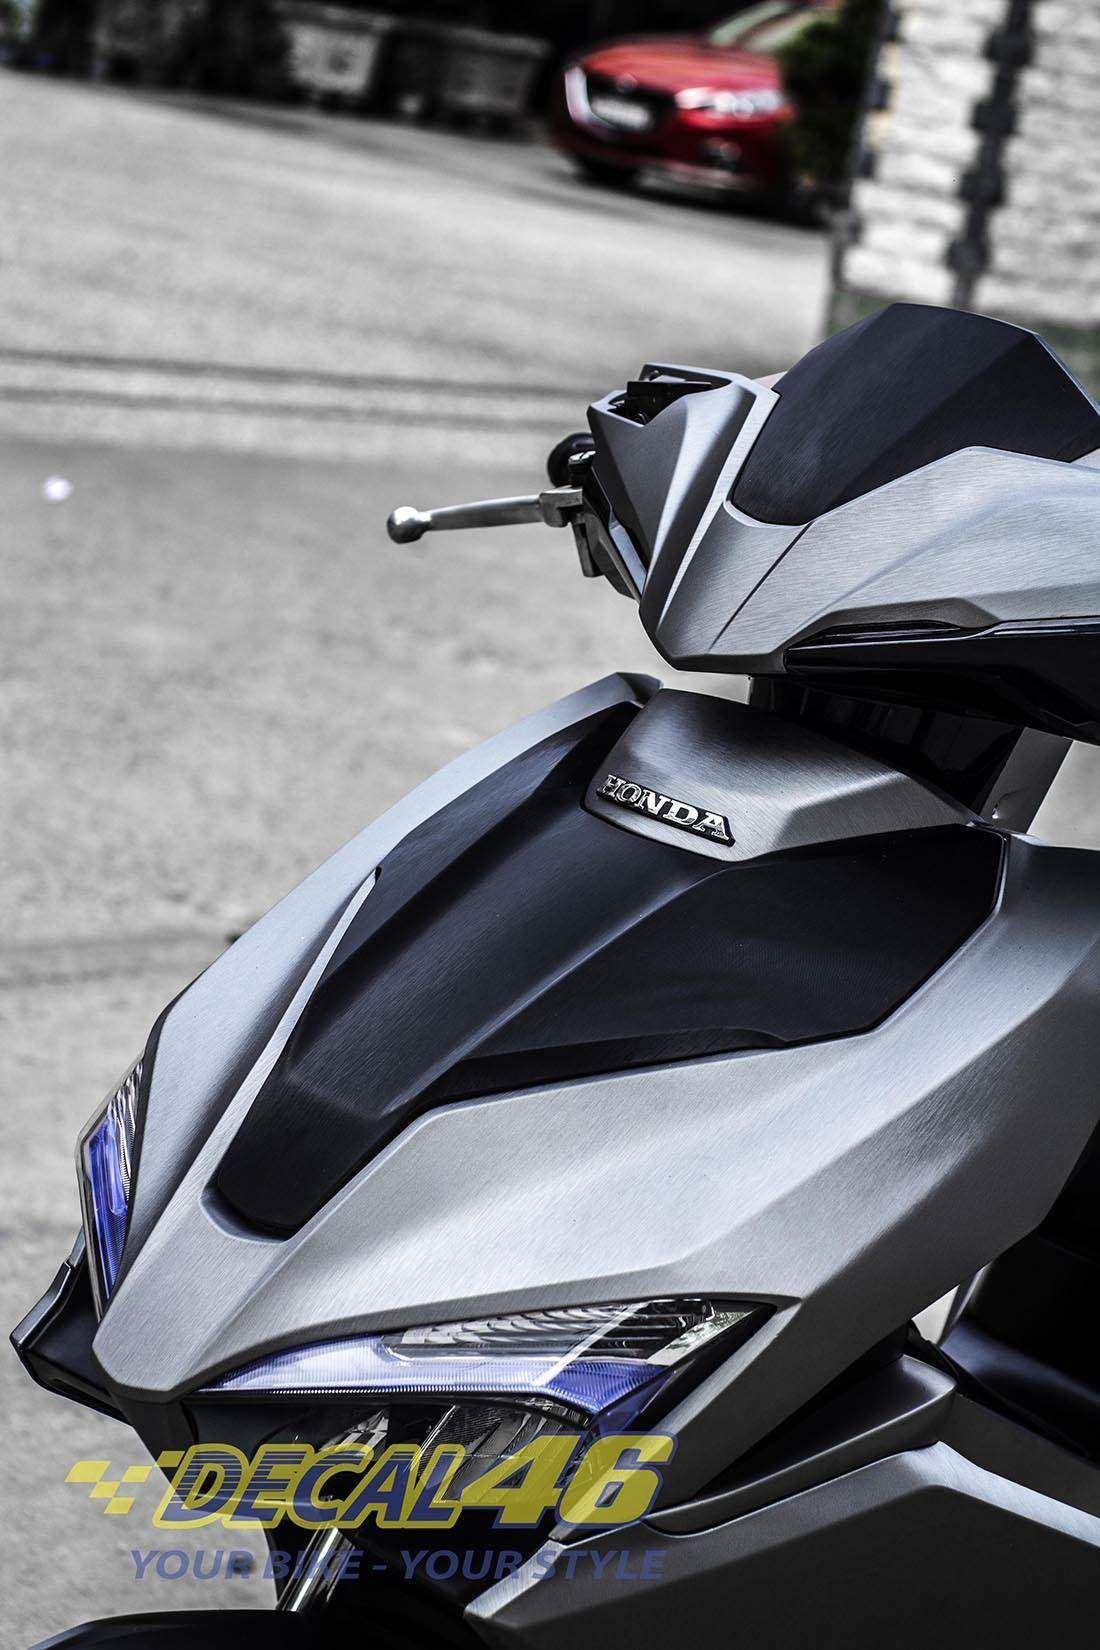 Tem xe Honda Airblade 2016 - 018 - Tem xe concept Nhôm xước xám